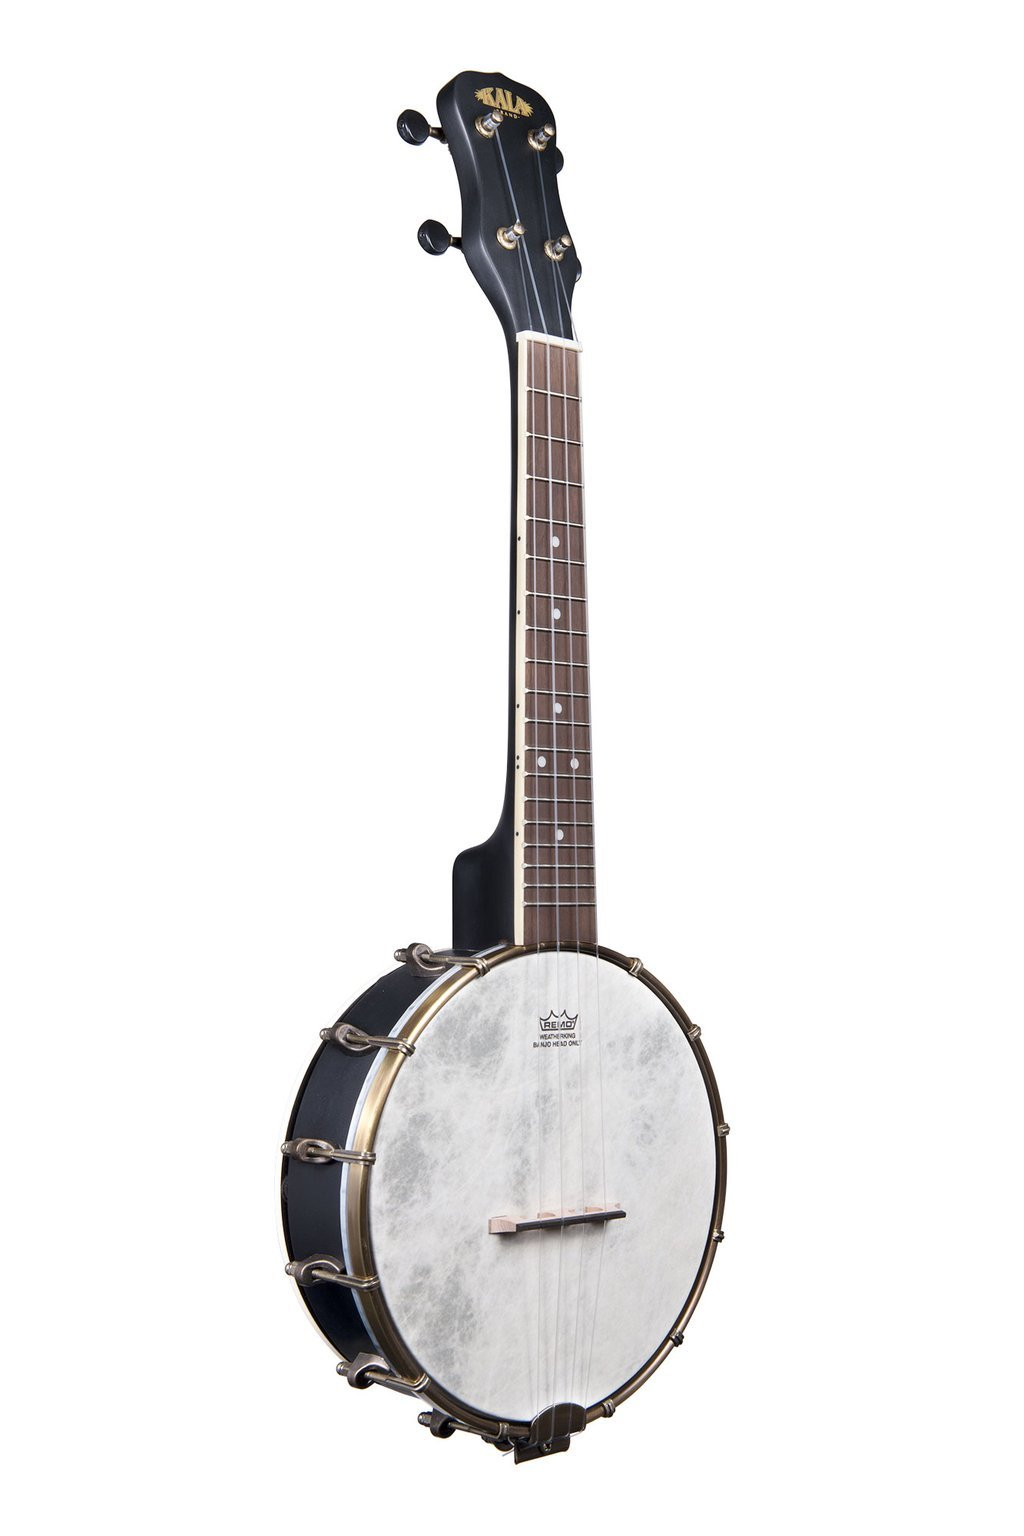 Kala Banjo Uke w/ Gig Bag